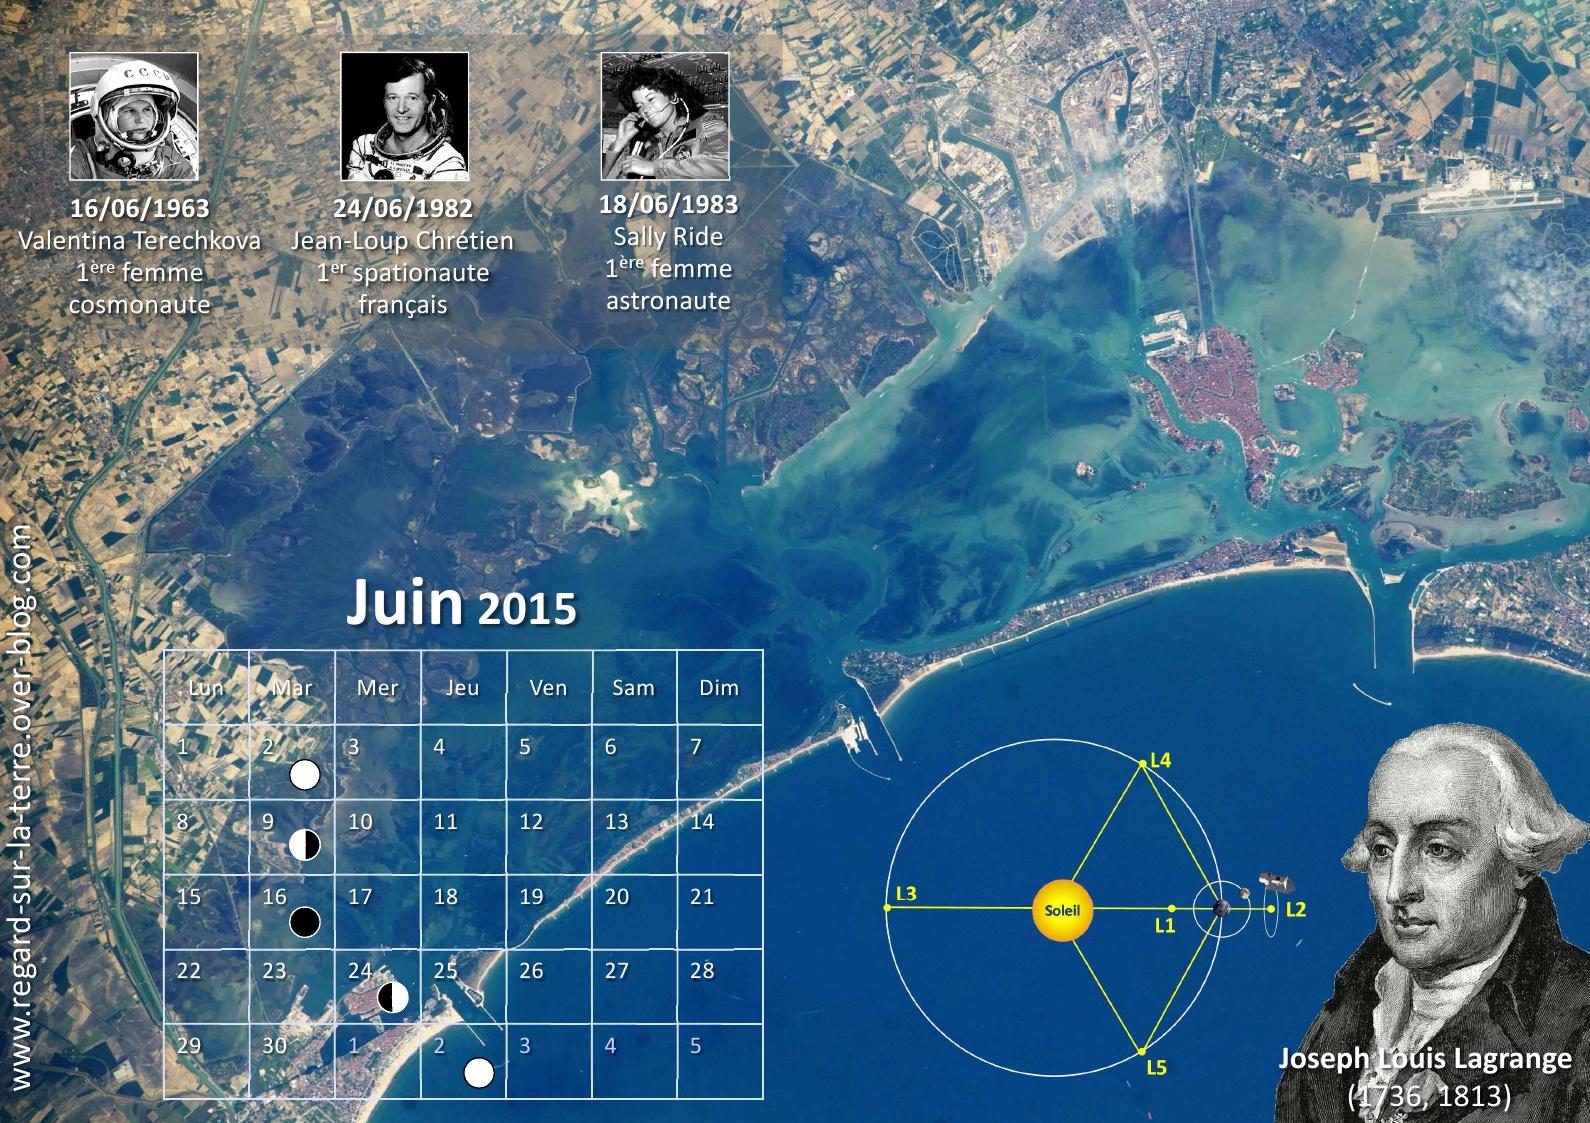 Calendrier spatial et astronomique - Juin 2015 - Valentina Terechkova - Jean-Loup Chrétien - Sally Ride - Shuttle MIR - Venise - ISS